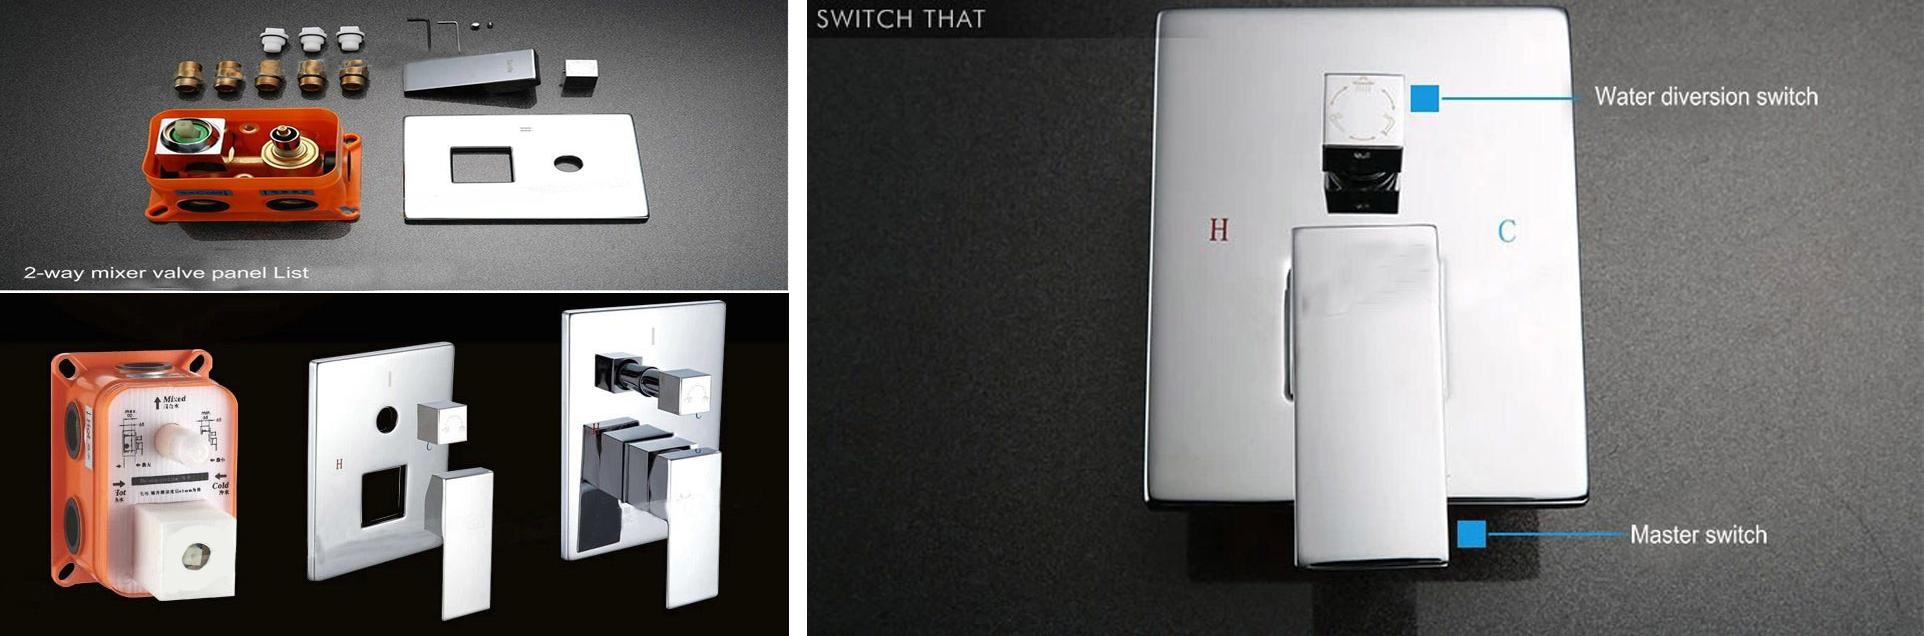 Installation Instructions 2 Way Shower Mixer - Bathselect Blog